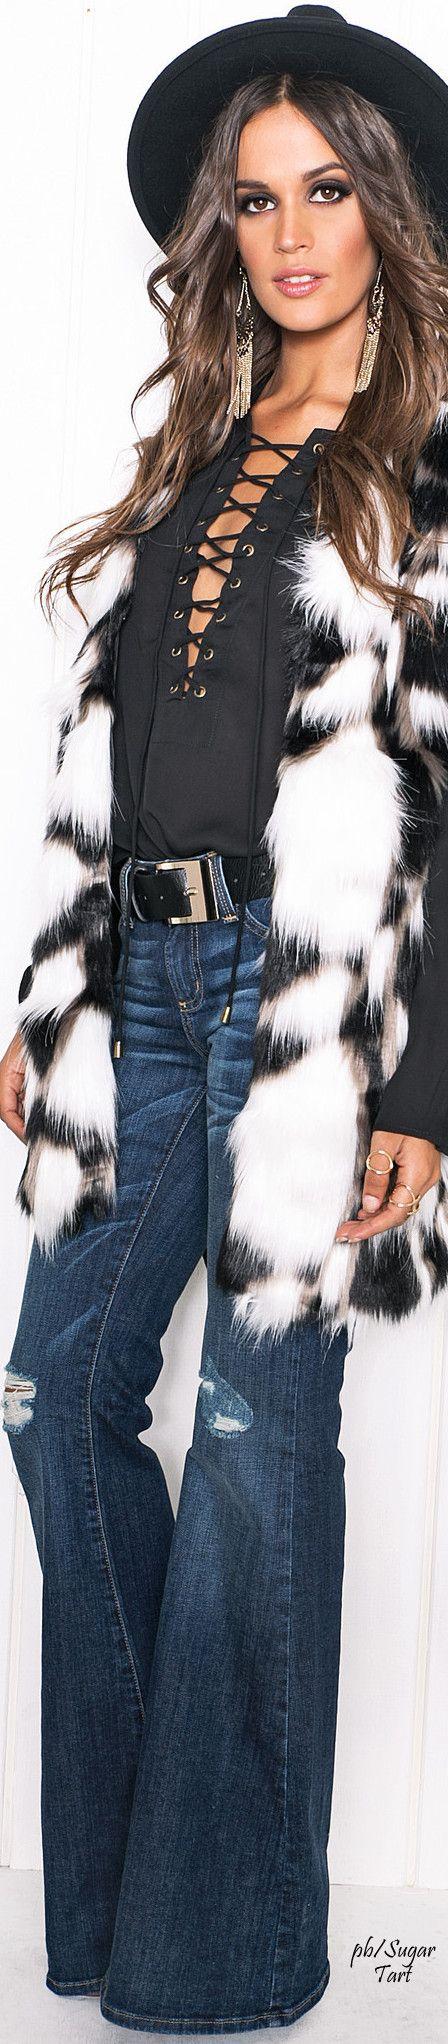 Boho Cowgirl  ≫∙∙☮ Bohème Babe ☮∙∙≪• ❤️ Babz ✿ιиѕριяαтισи❀ #abbigliamento #bohojewelry #boho